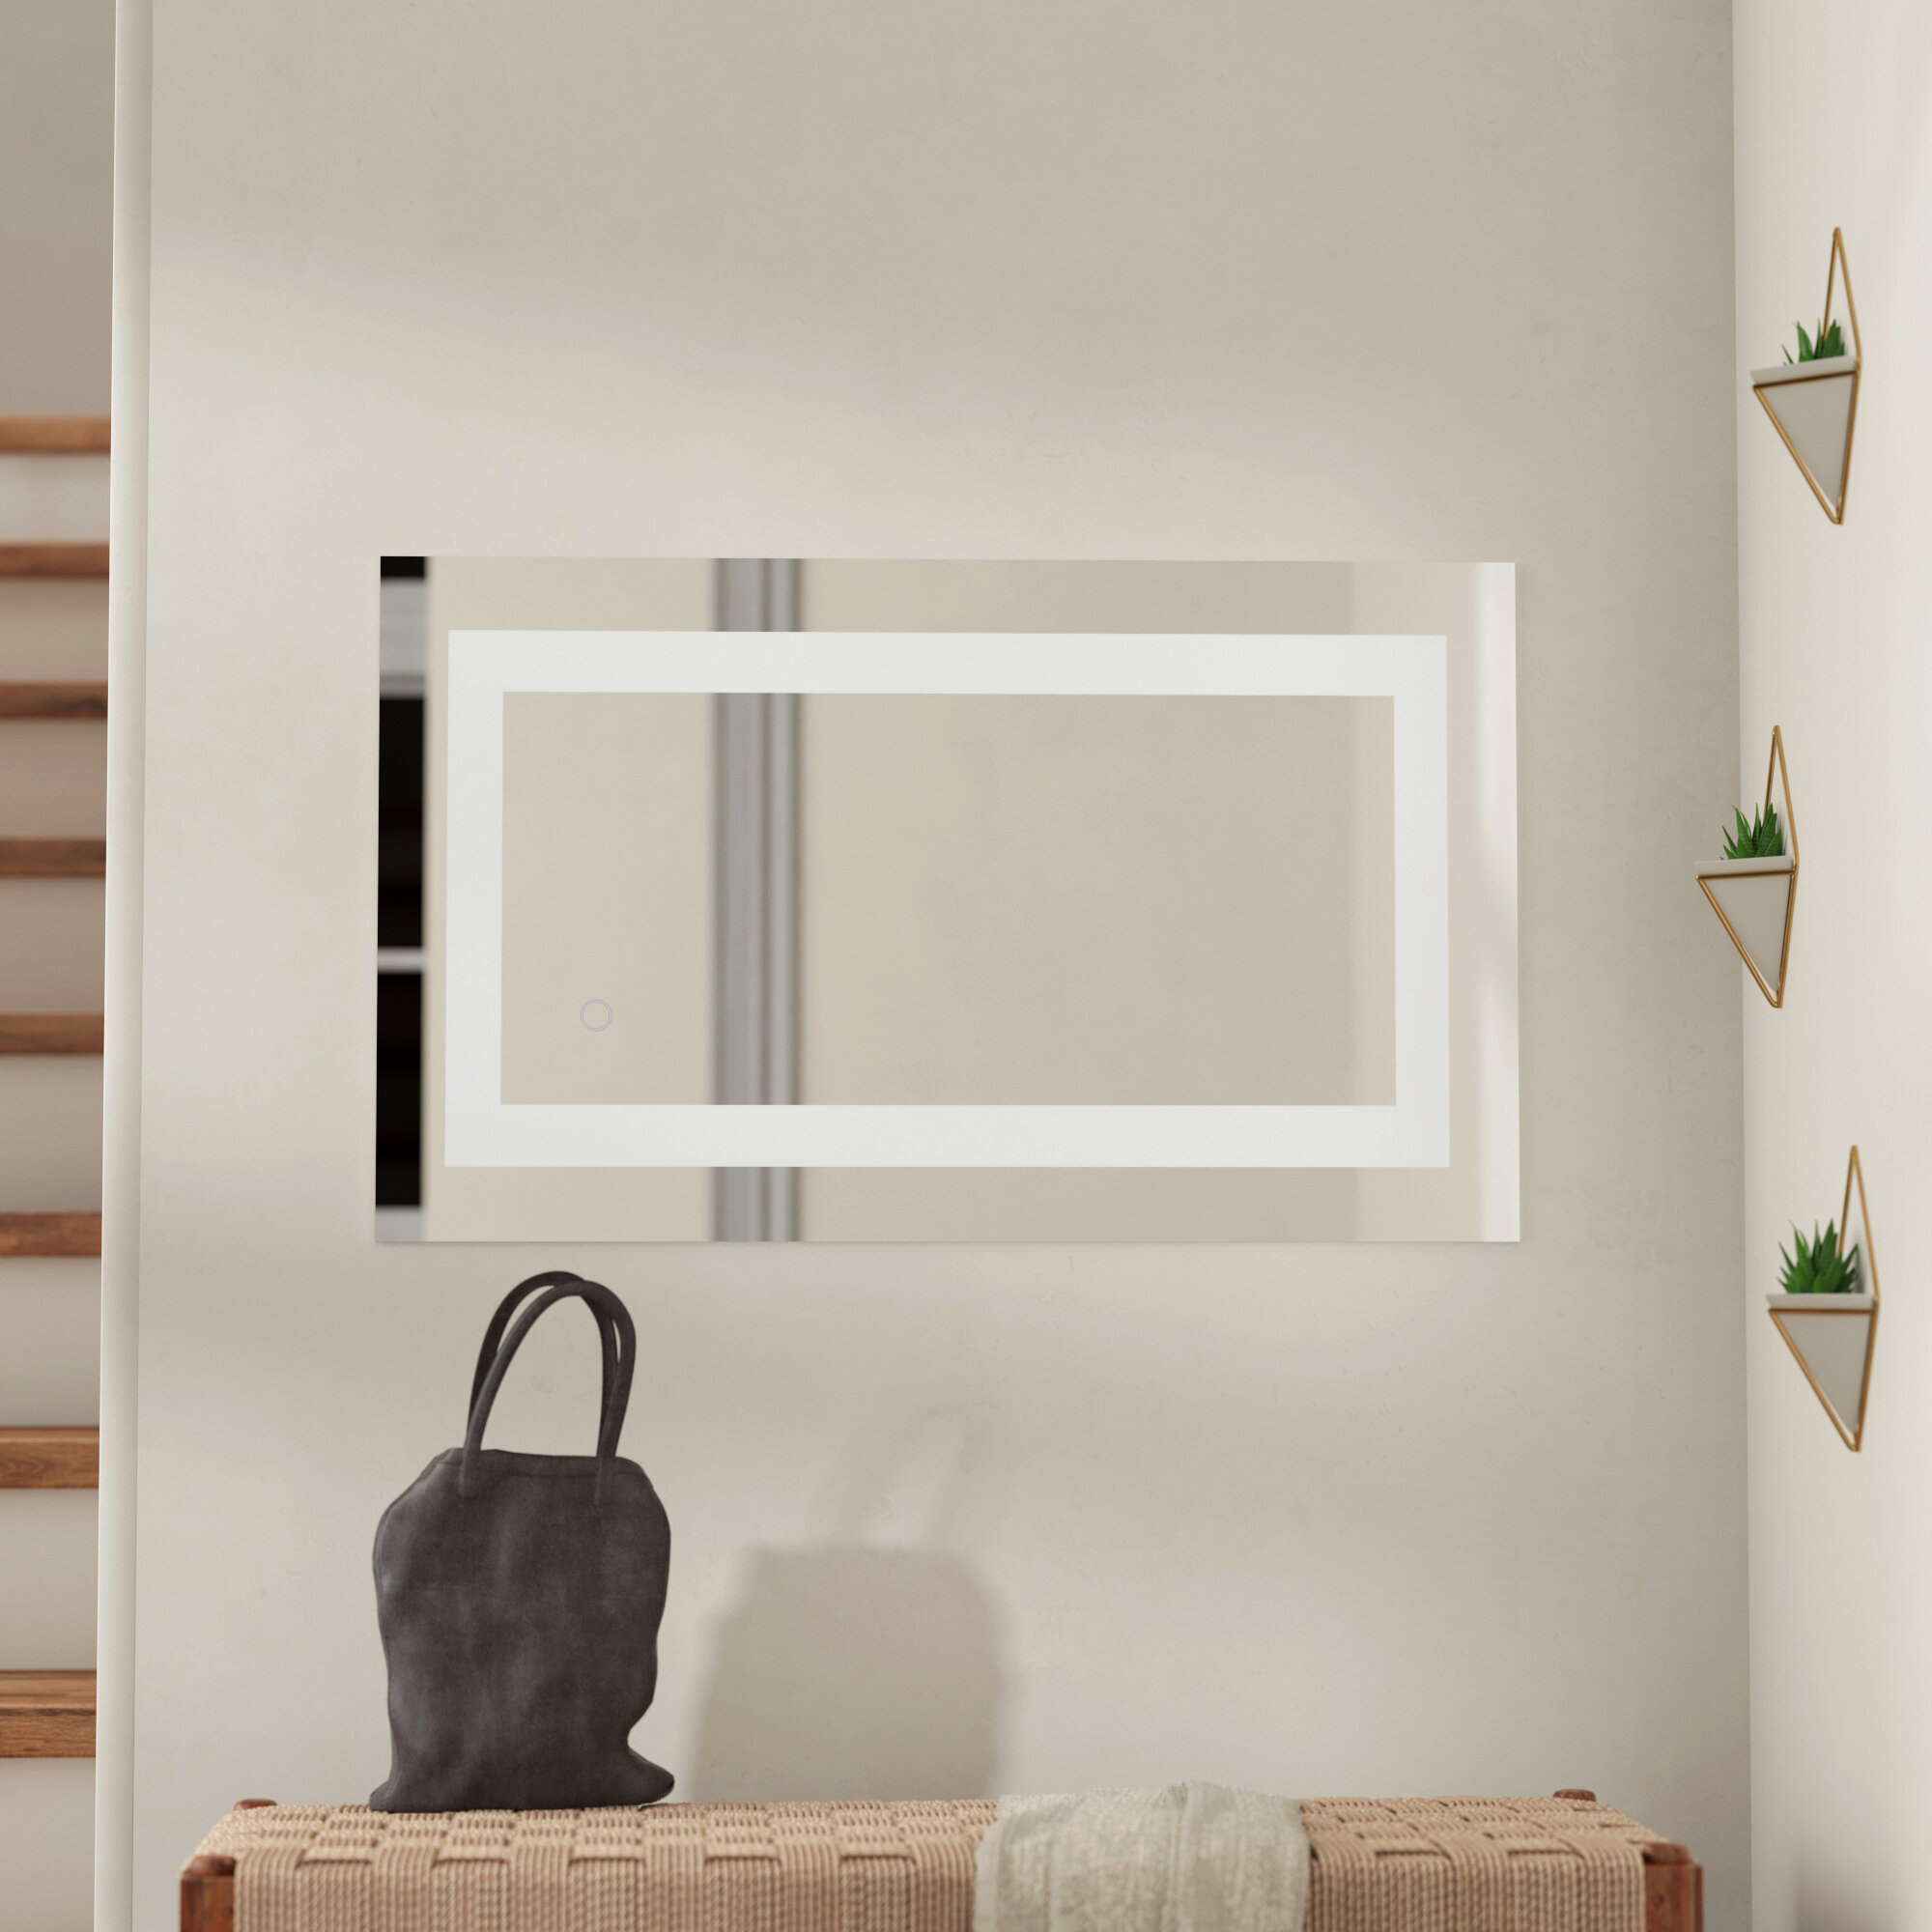 Peachy Tulloch Hardwired Led Lighted Bathroom Mirror Download Free Architecture Designs Scobabritishbridgeorg